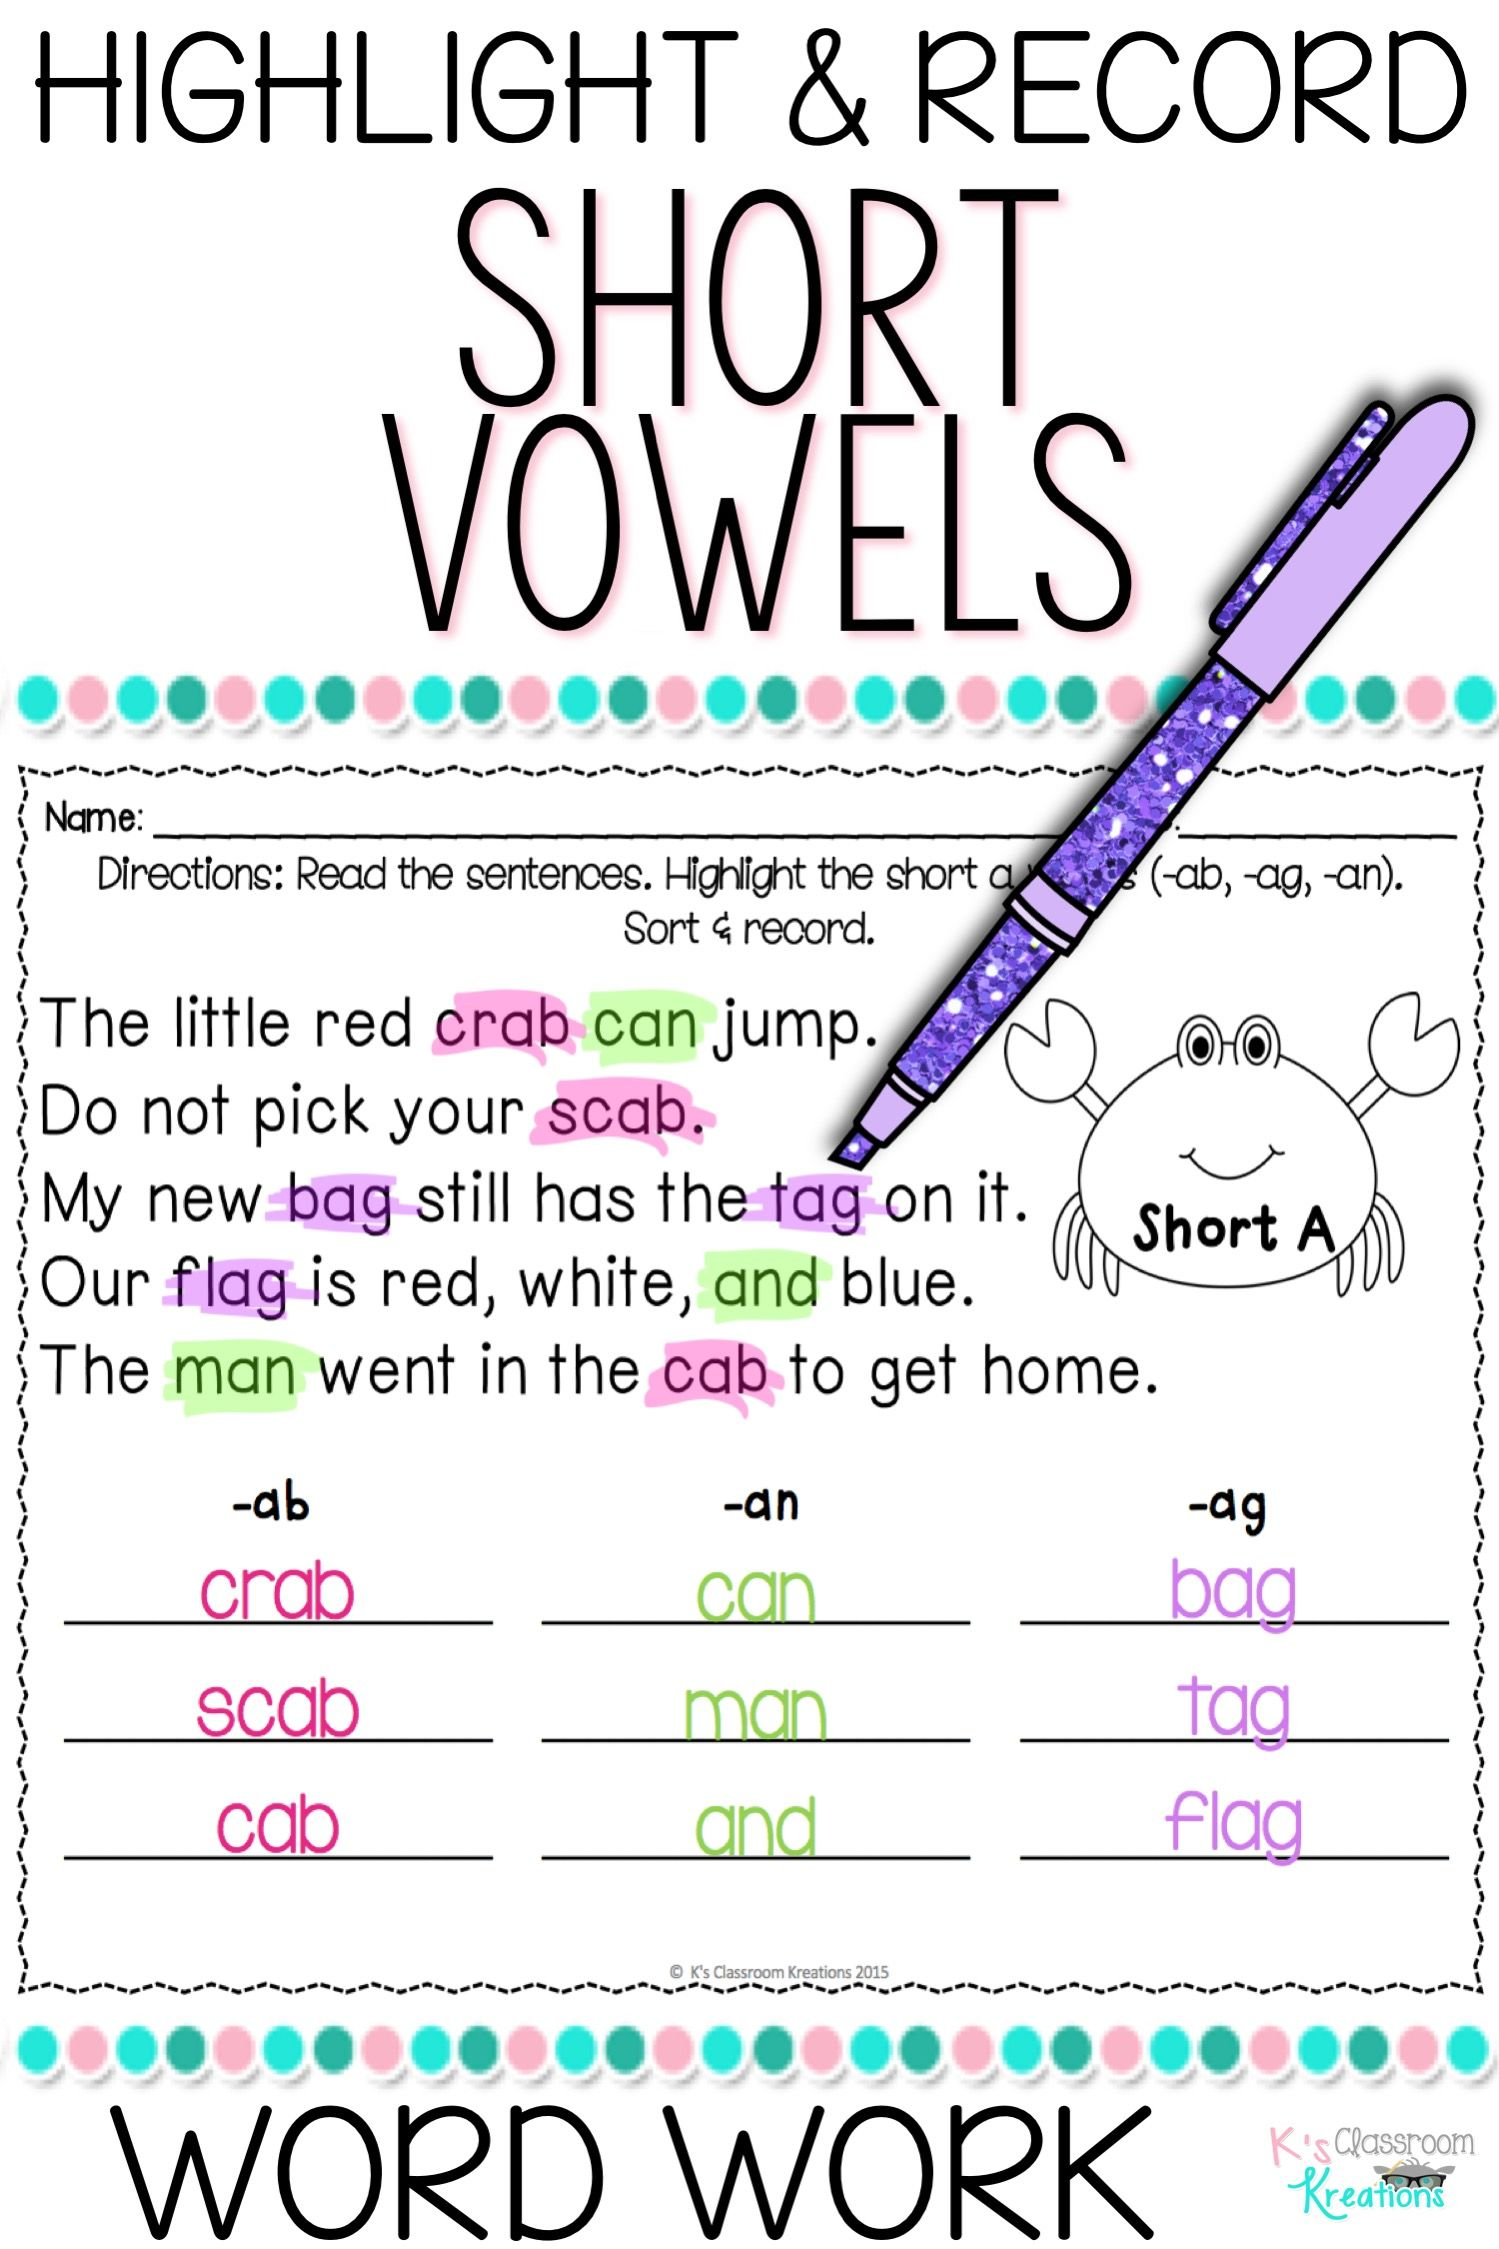 hight resolution of Short Vowel Spelling Practice   Word work